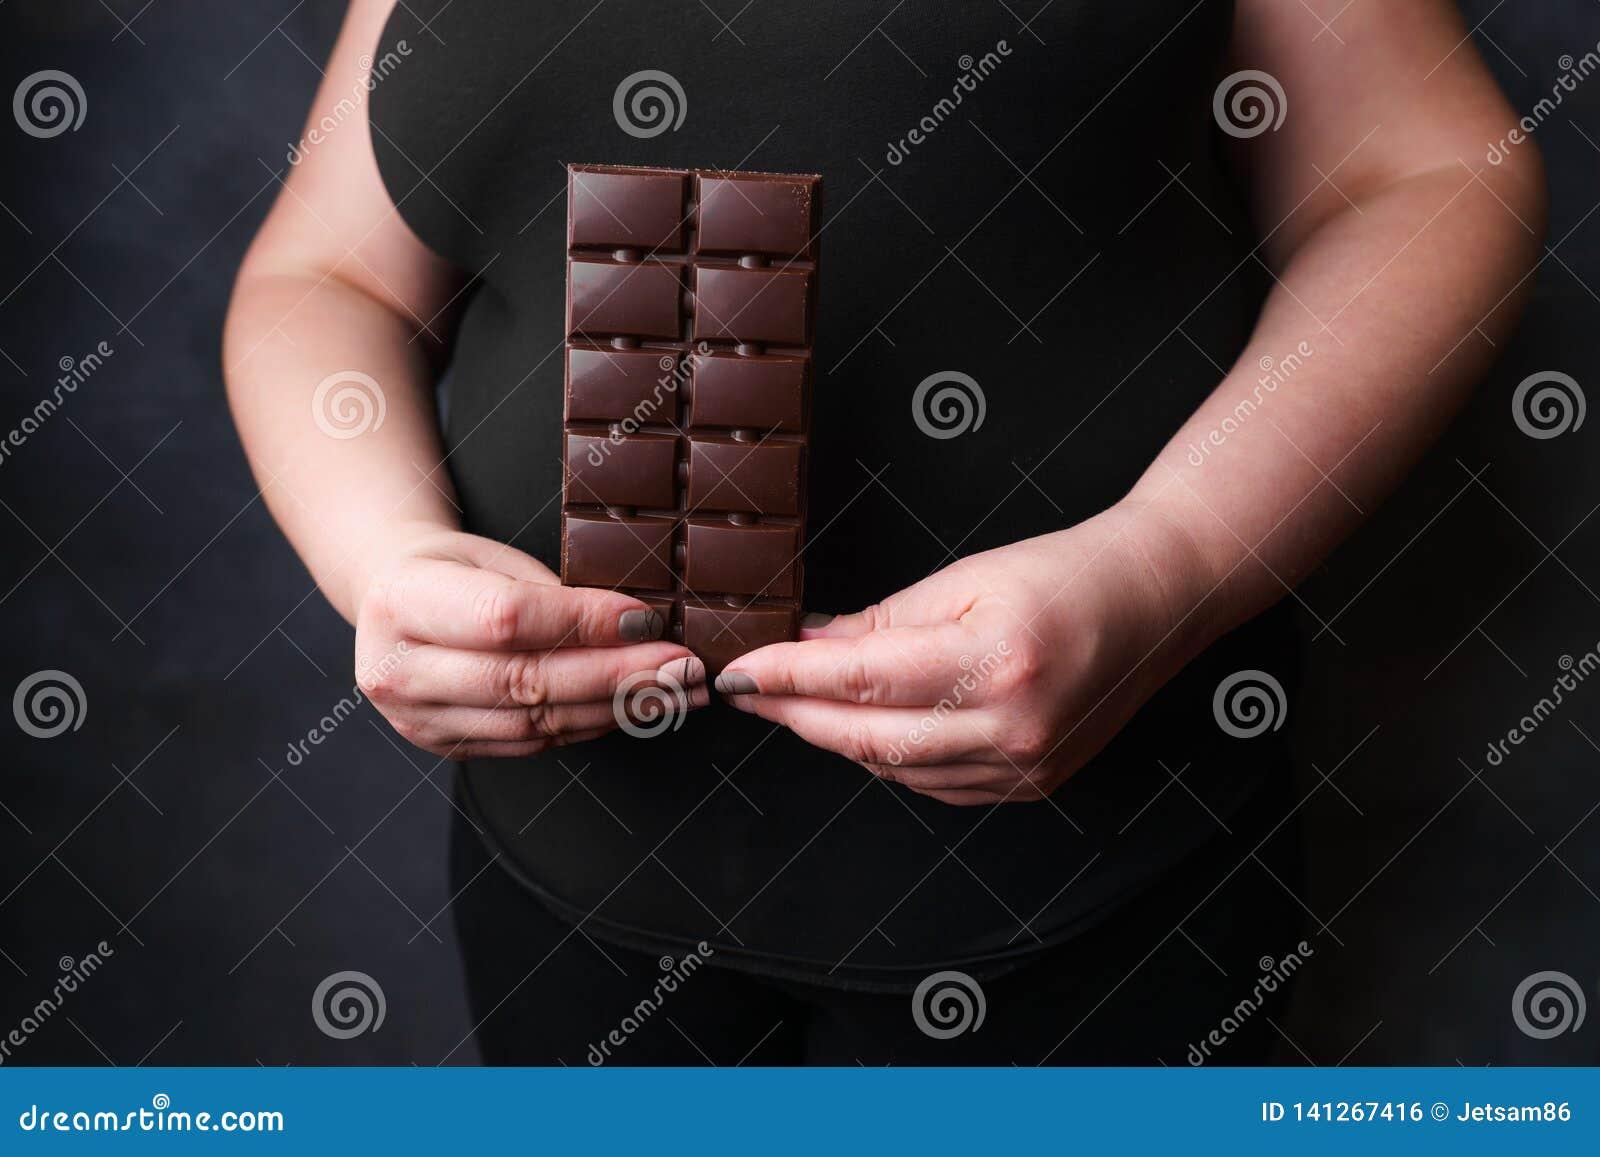 diabetes dieta pérdida de peso